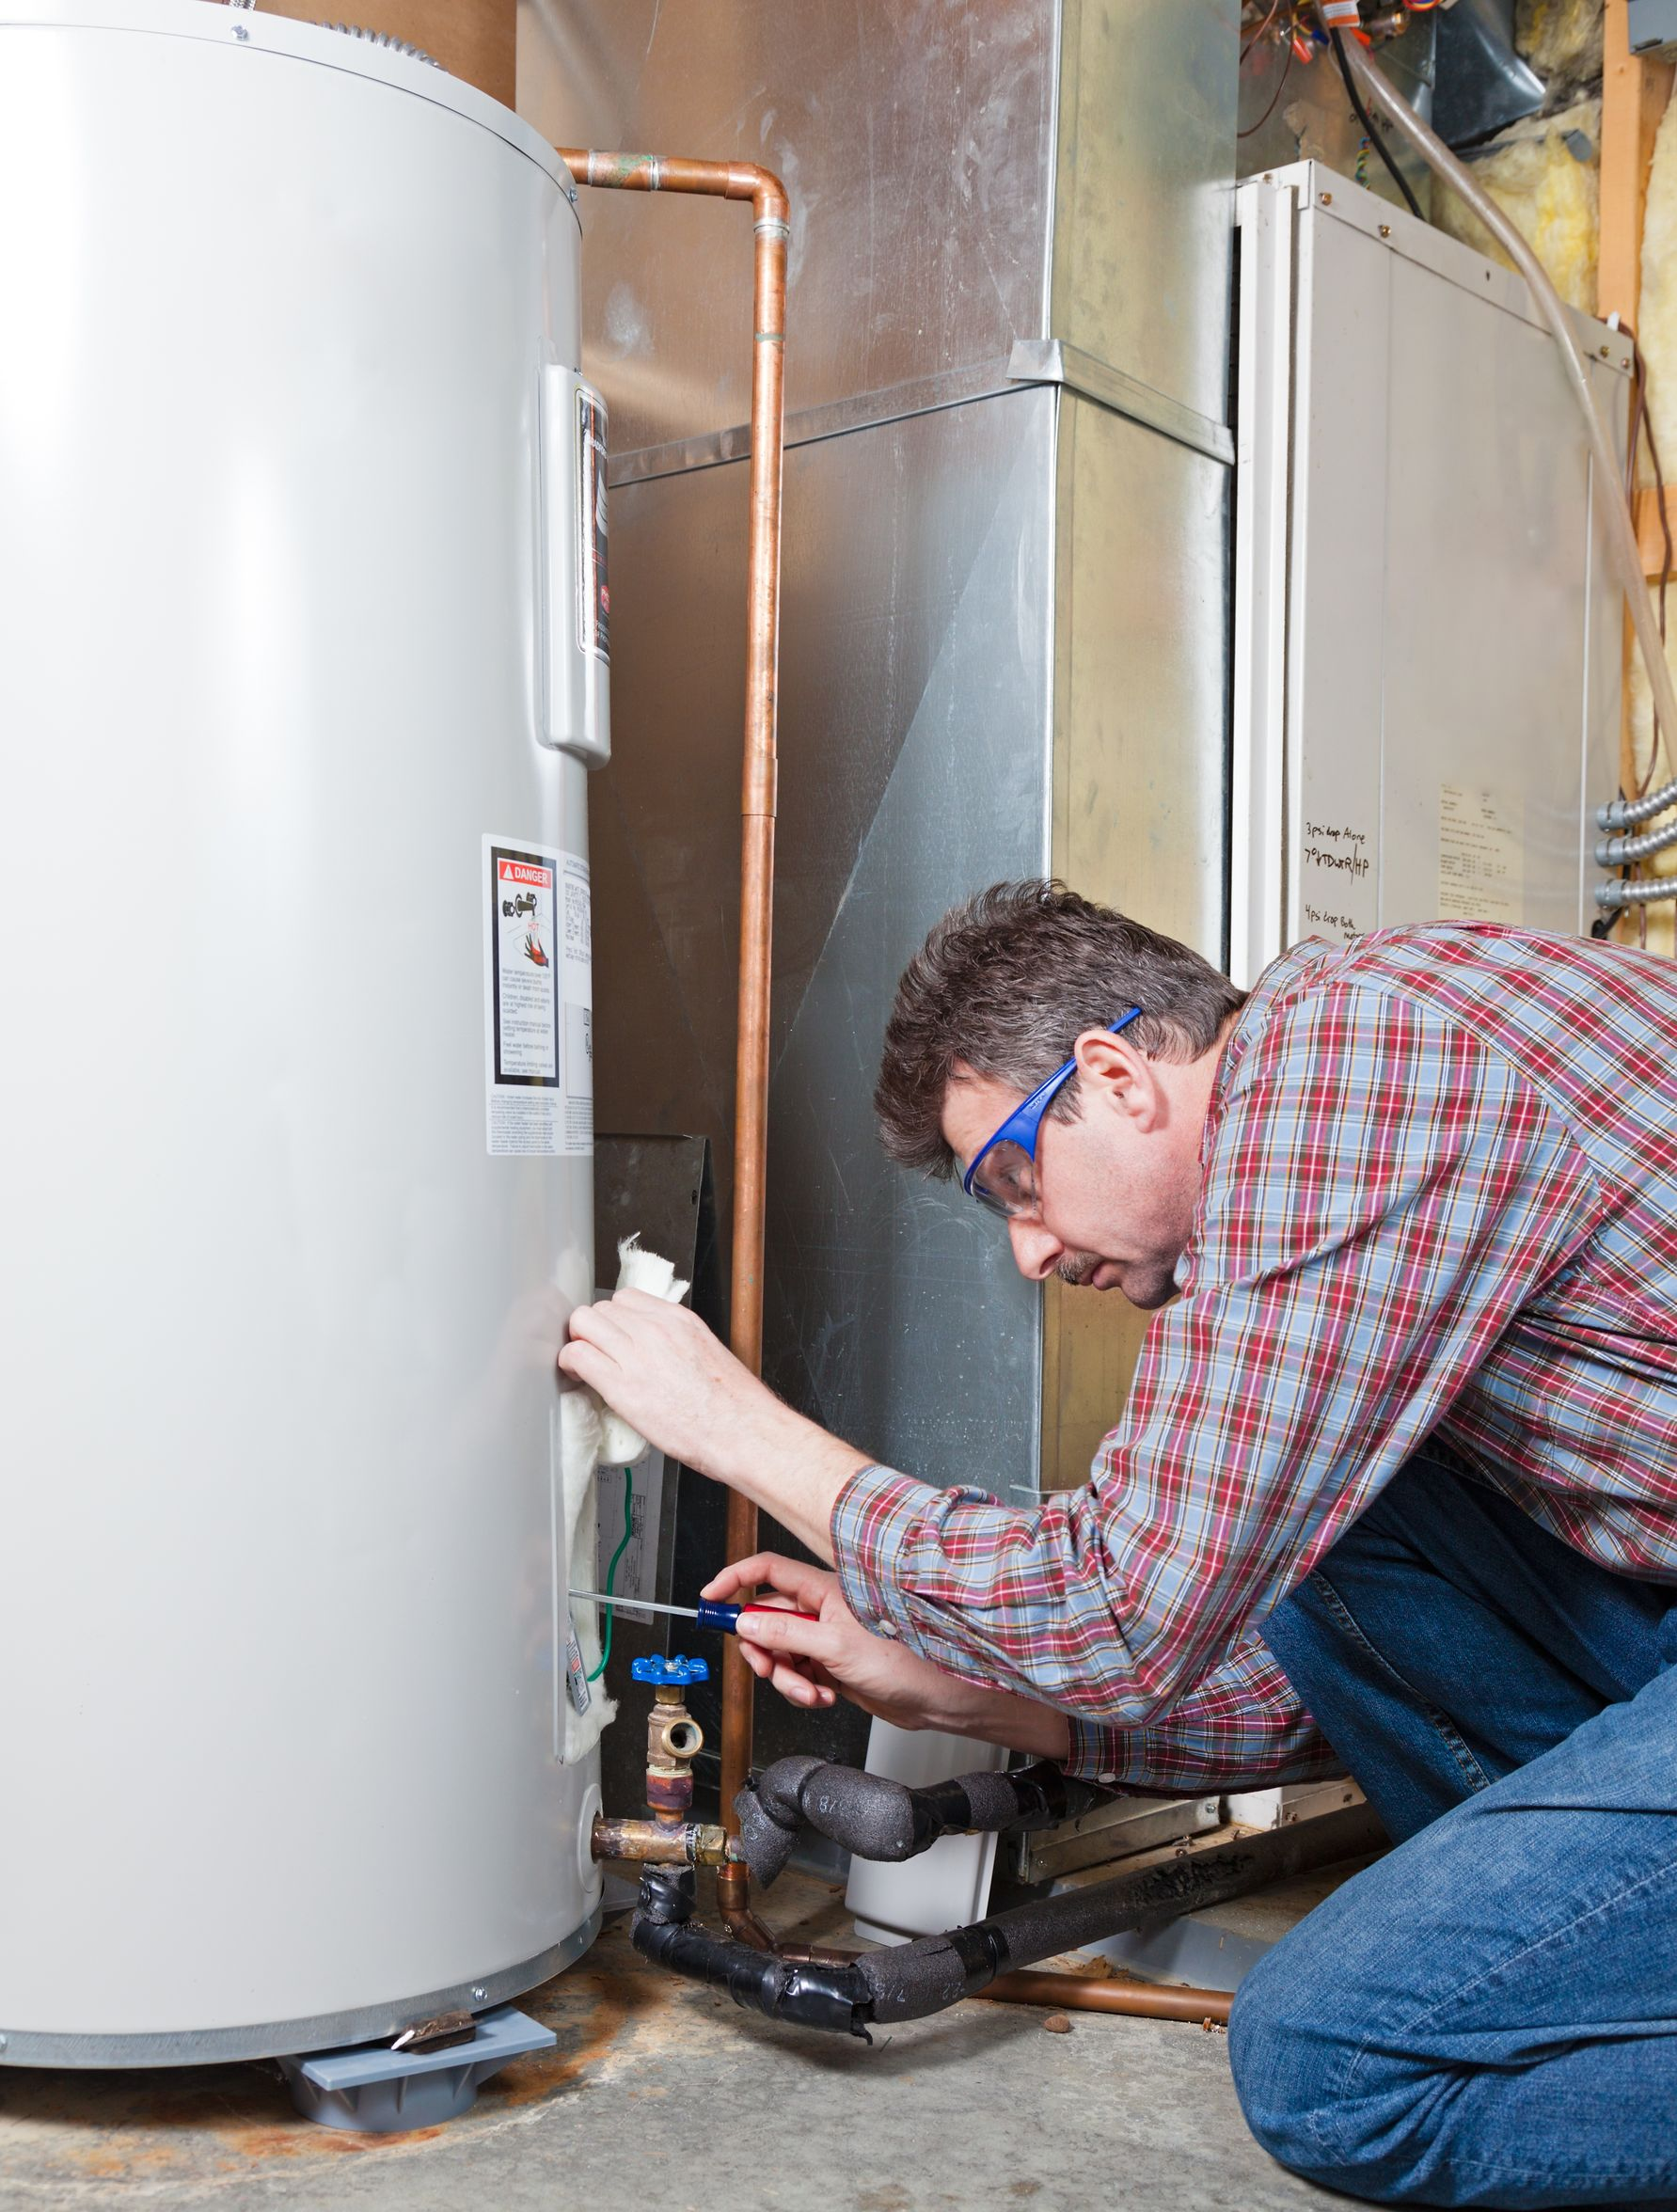 man repairing water heater